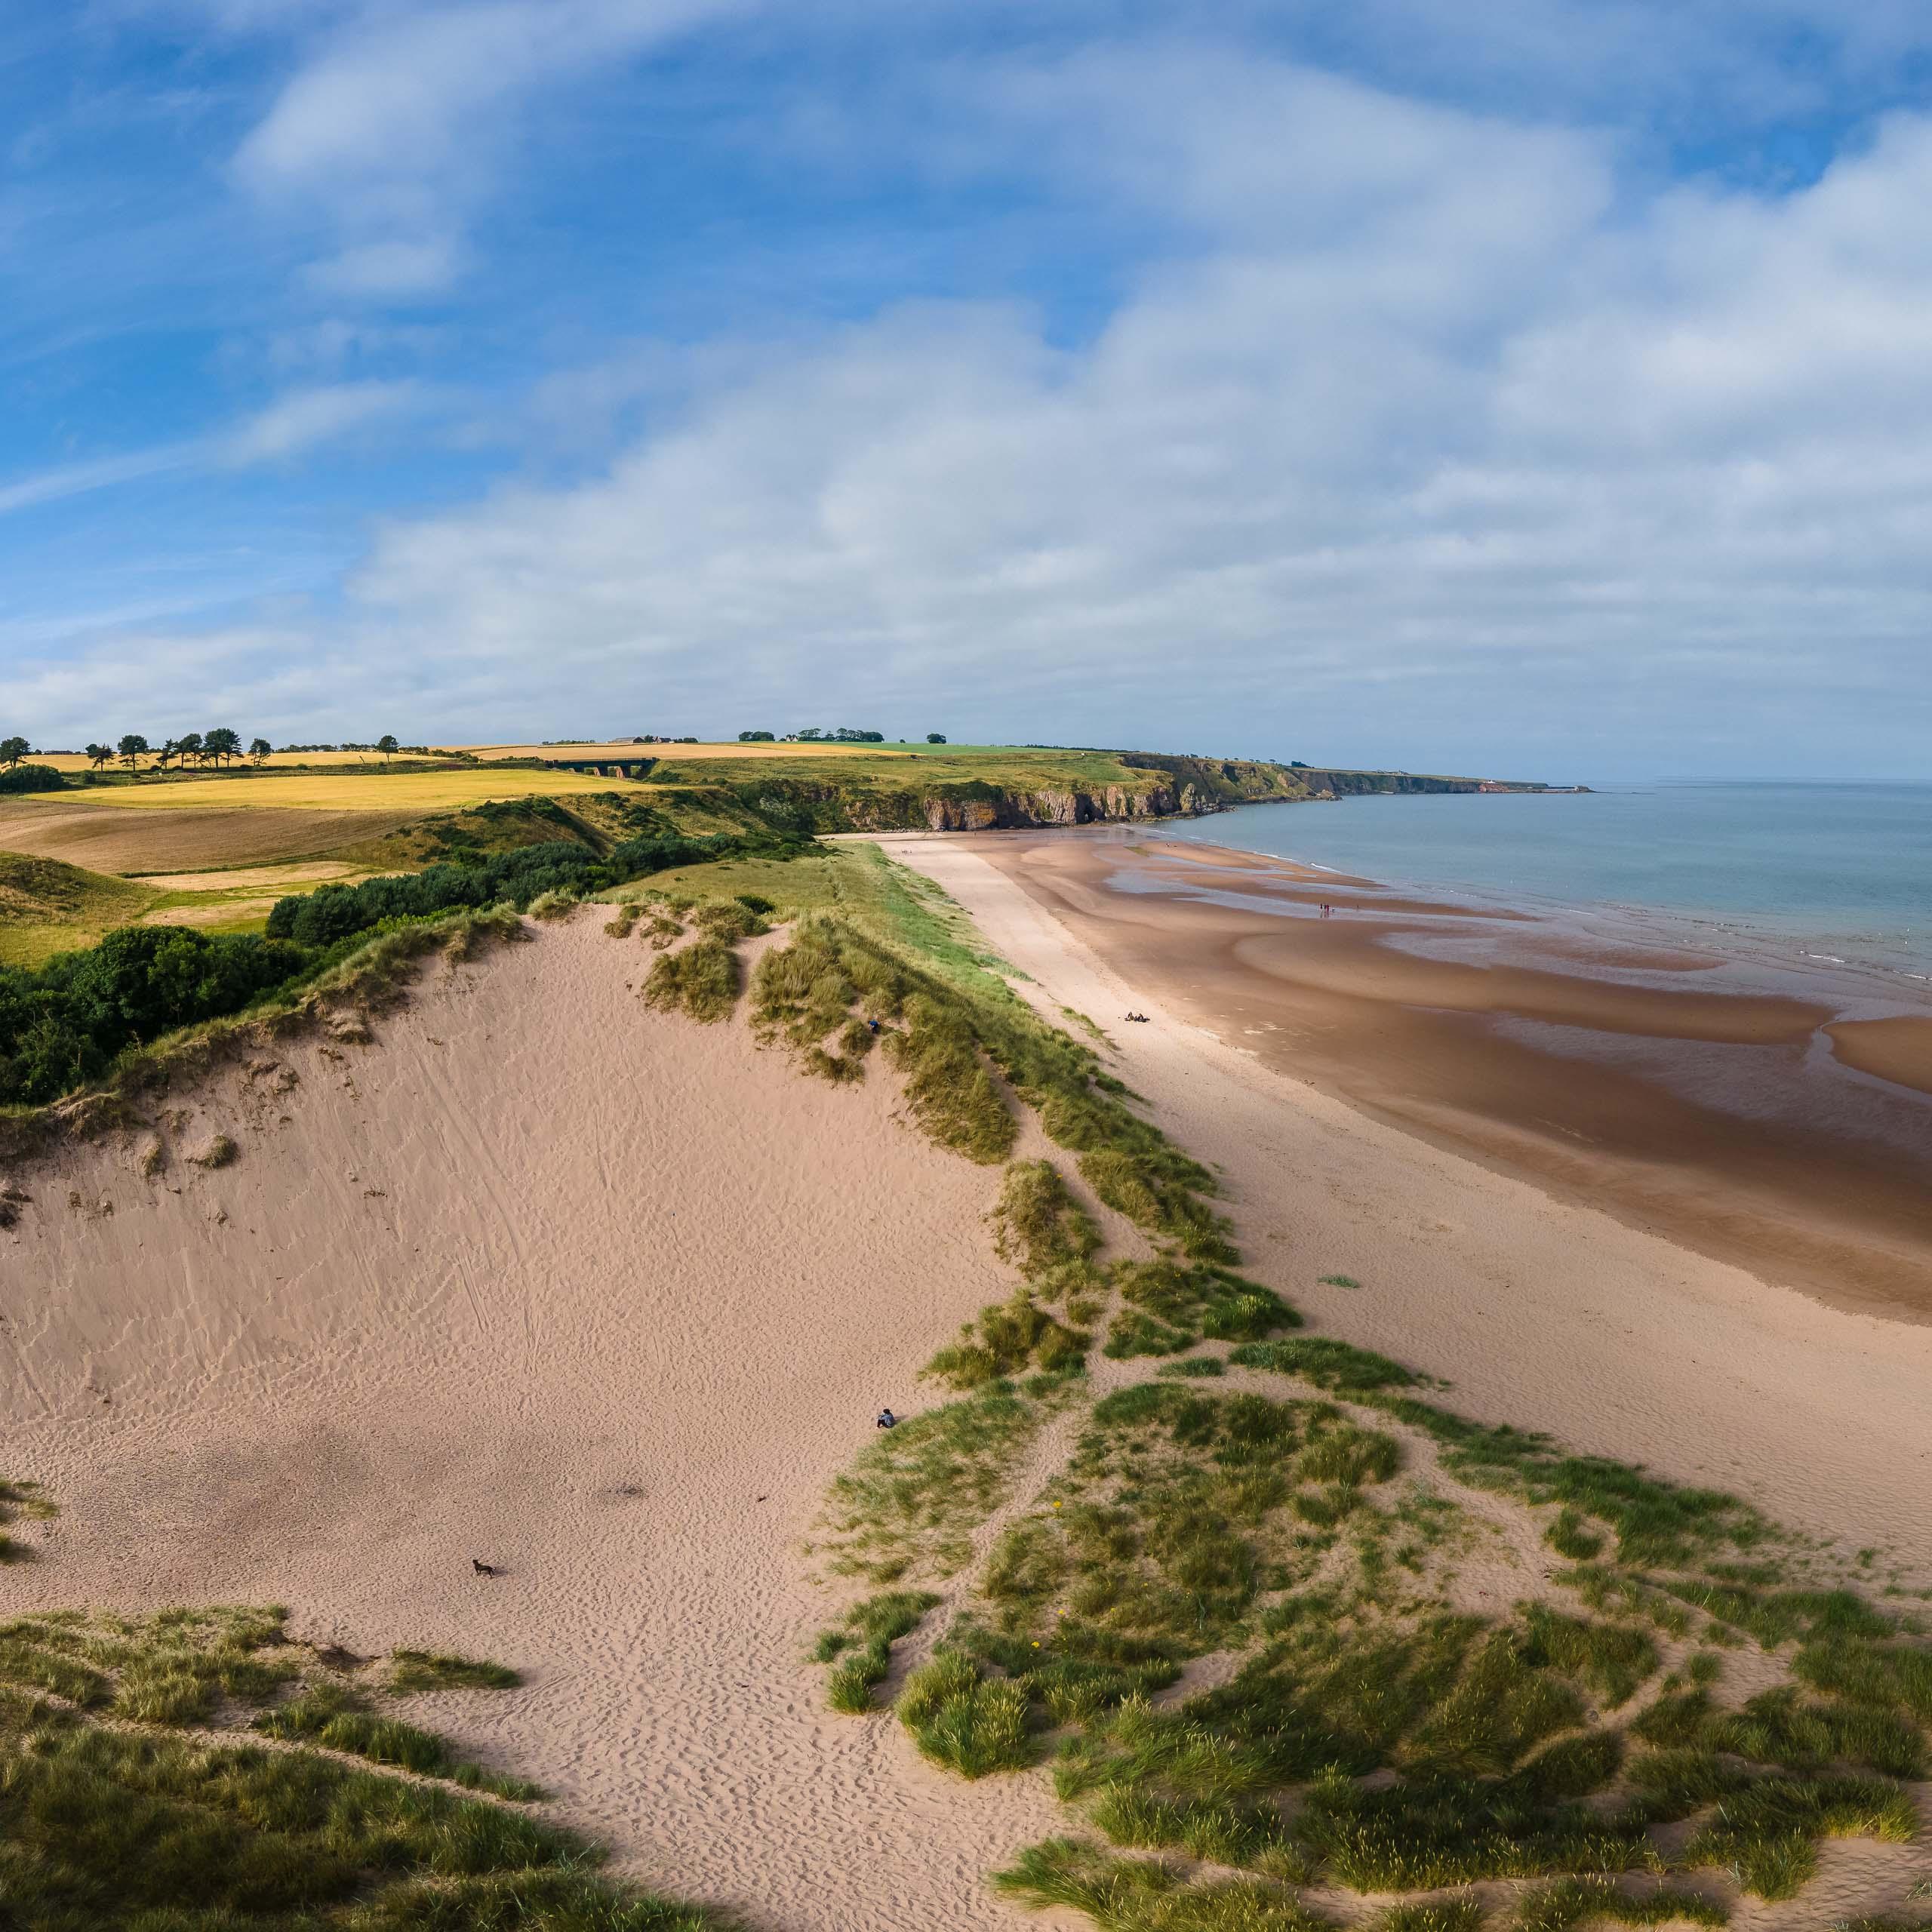 Large sand dunes at Lunan Bay beach